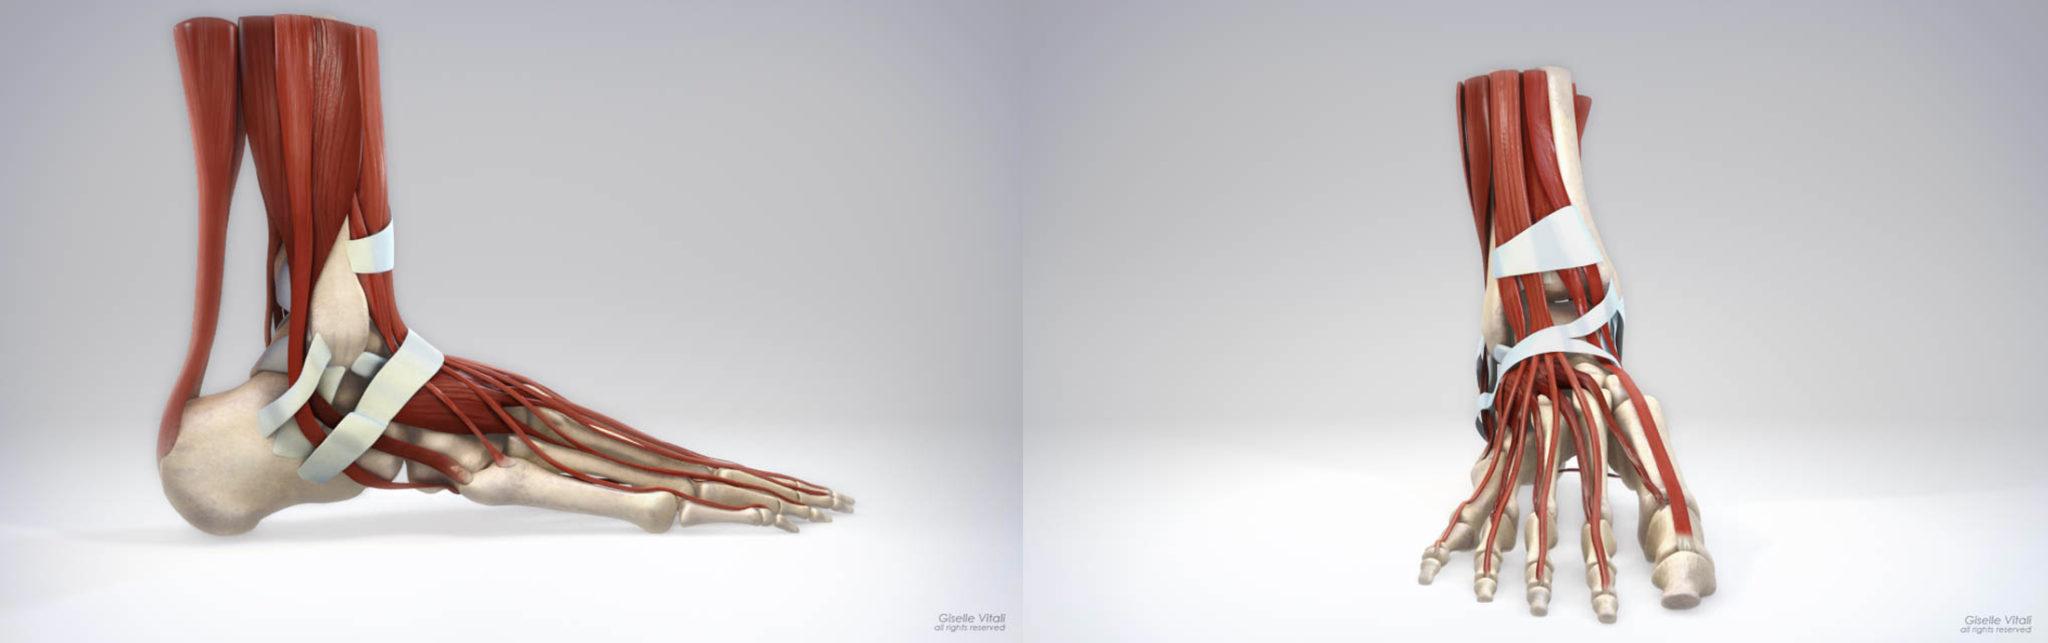 lesiones pie_ giselle vitali 3D